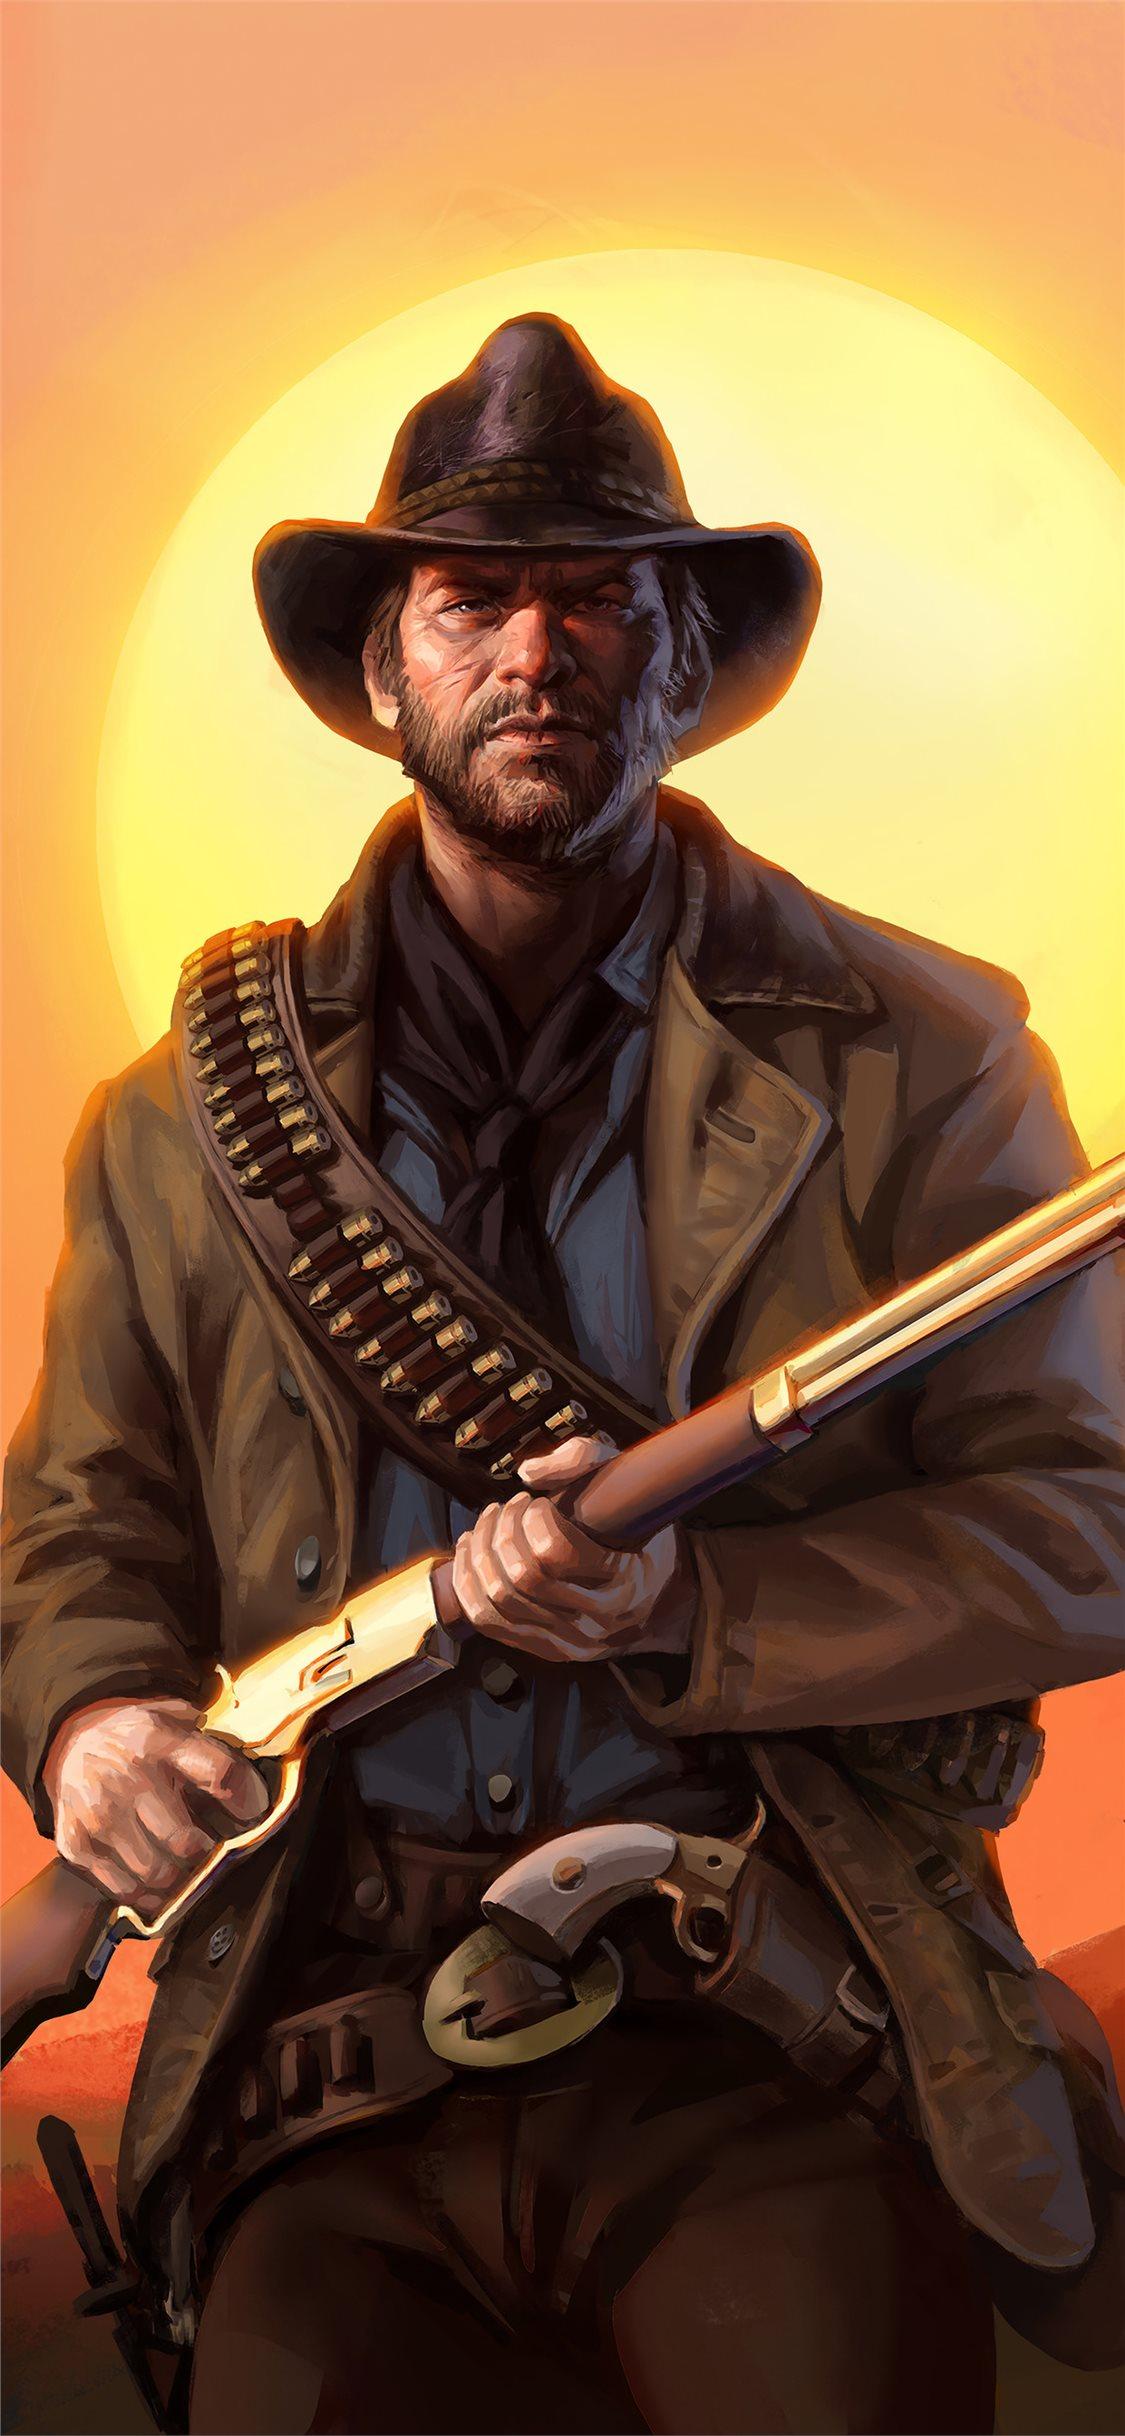 Gangster Wallpaper For Iphone - Red Dead Redemption 2 Arthur Morgan Fanart , HD Wallpaper & Backgrounds